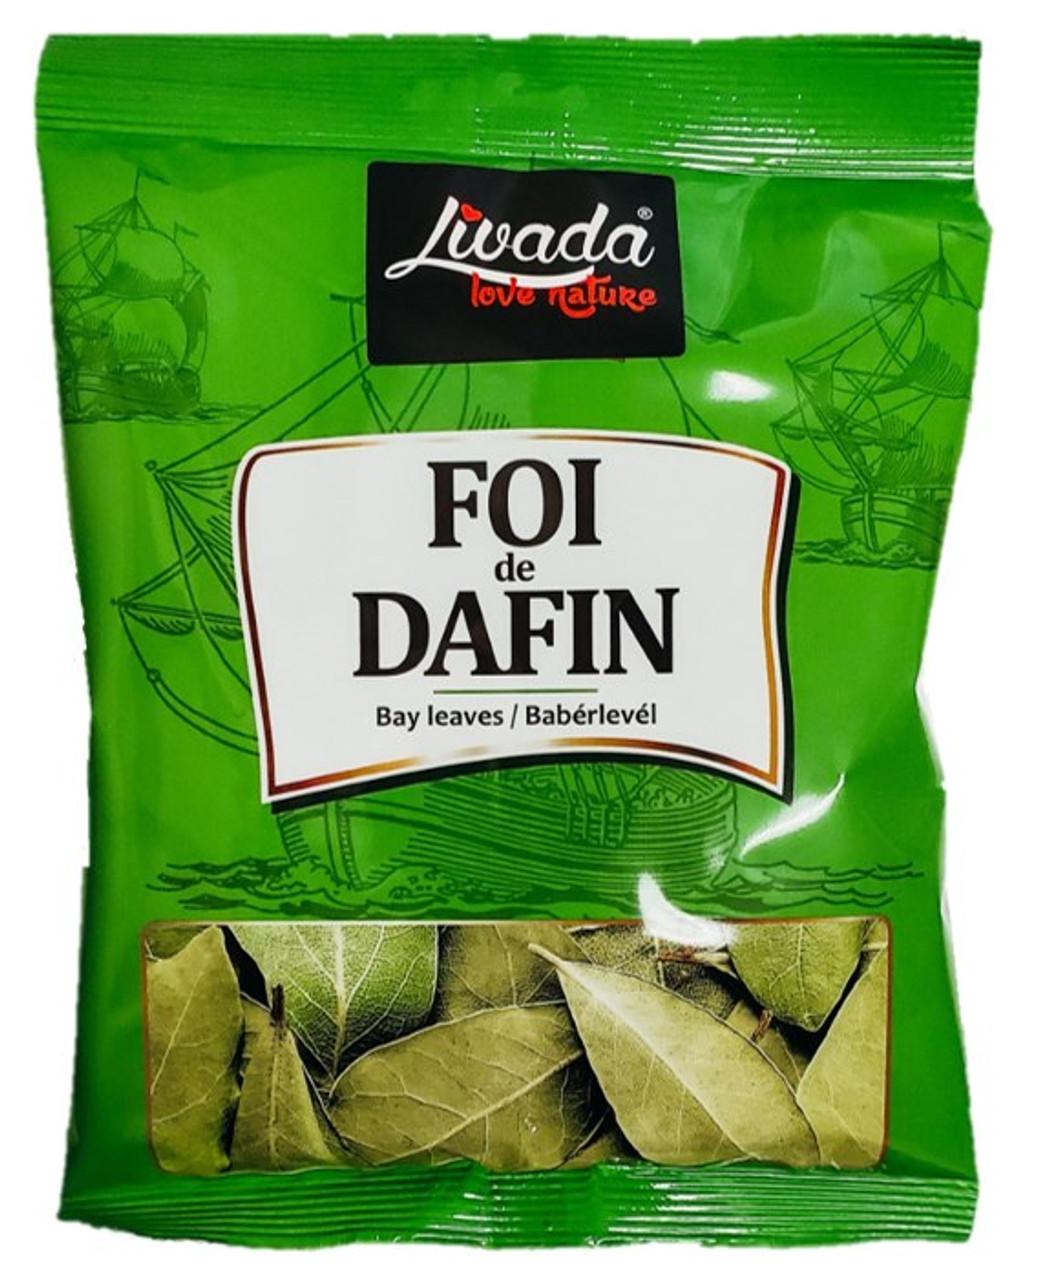 LIVADA Foi de Dafin (Bay Leaves) 15g